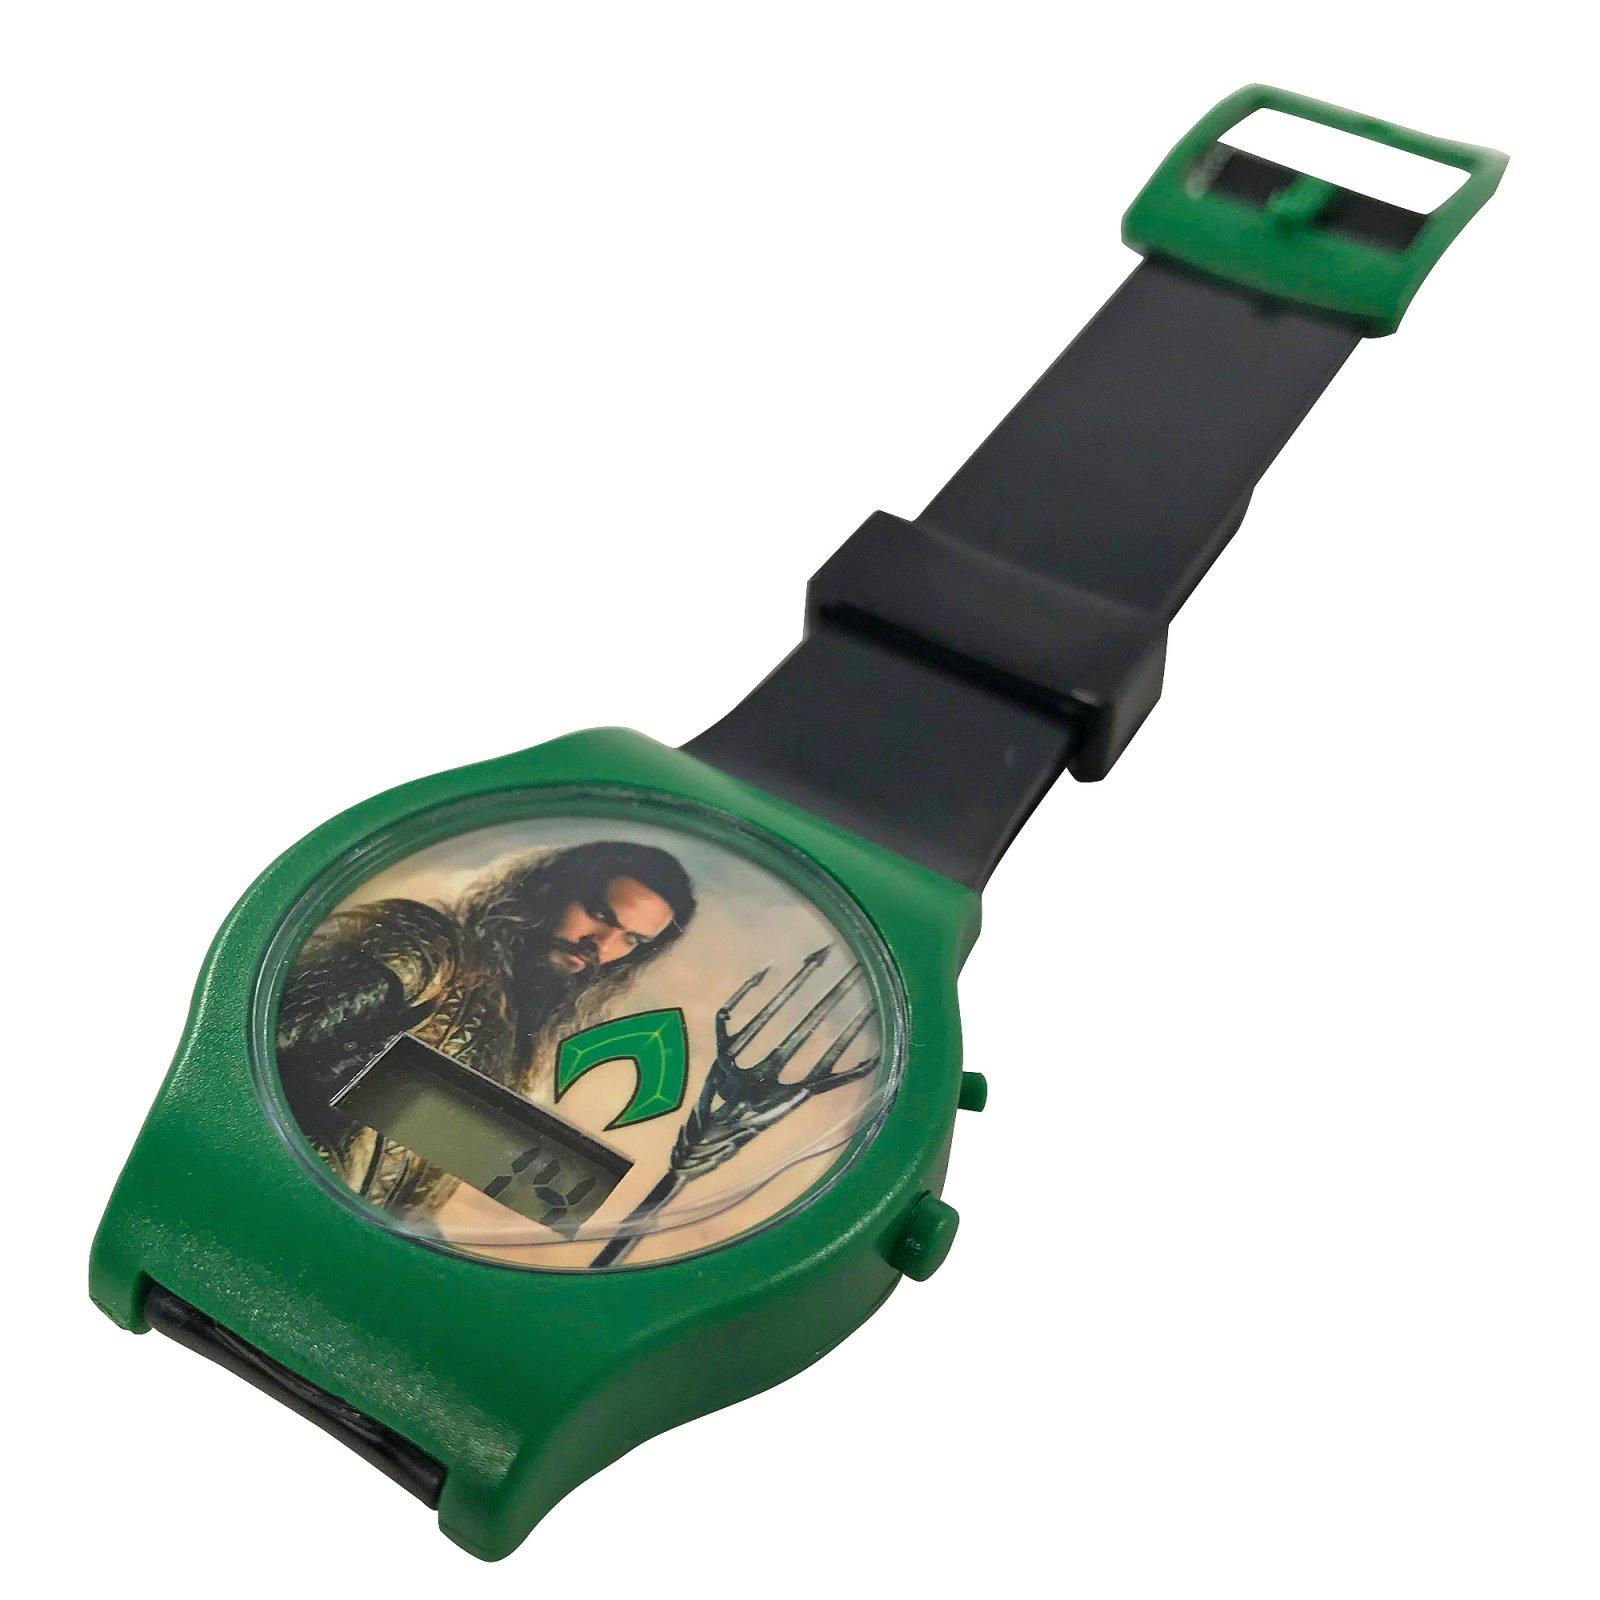 Aquaman Justice League Digital LCD Wrist Watch Kids Adjustable Strap